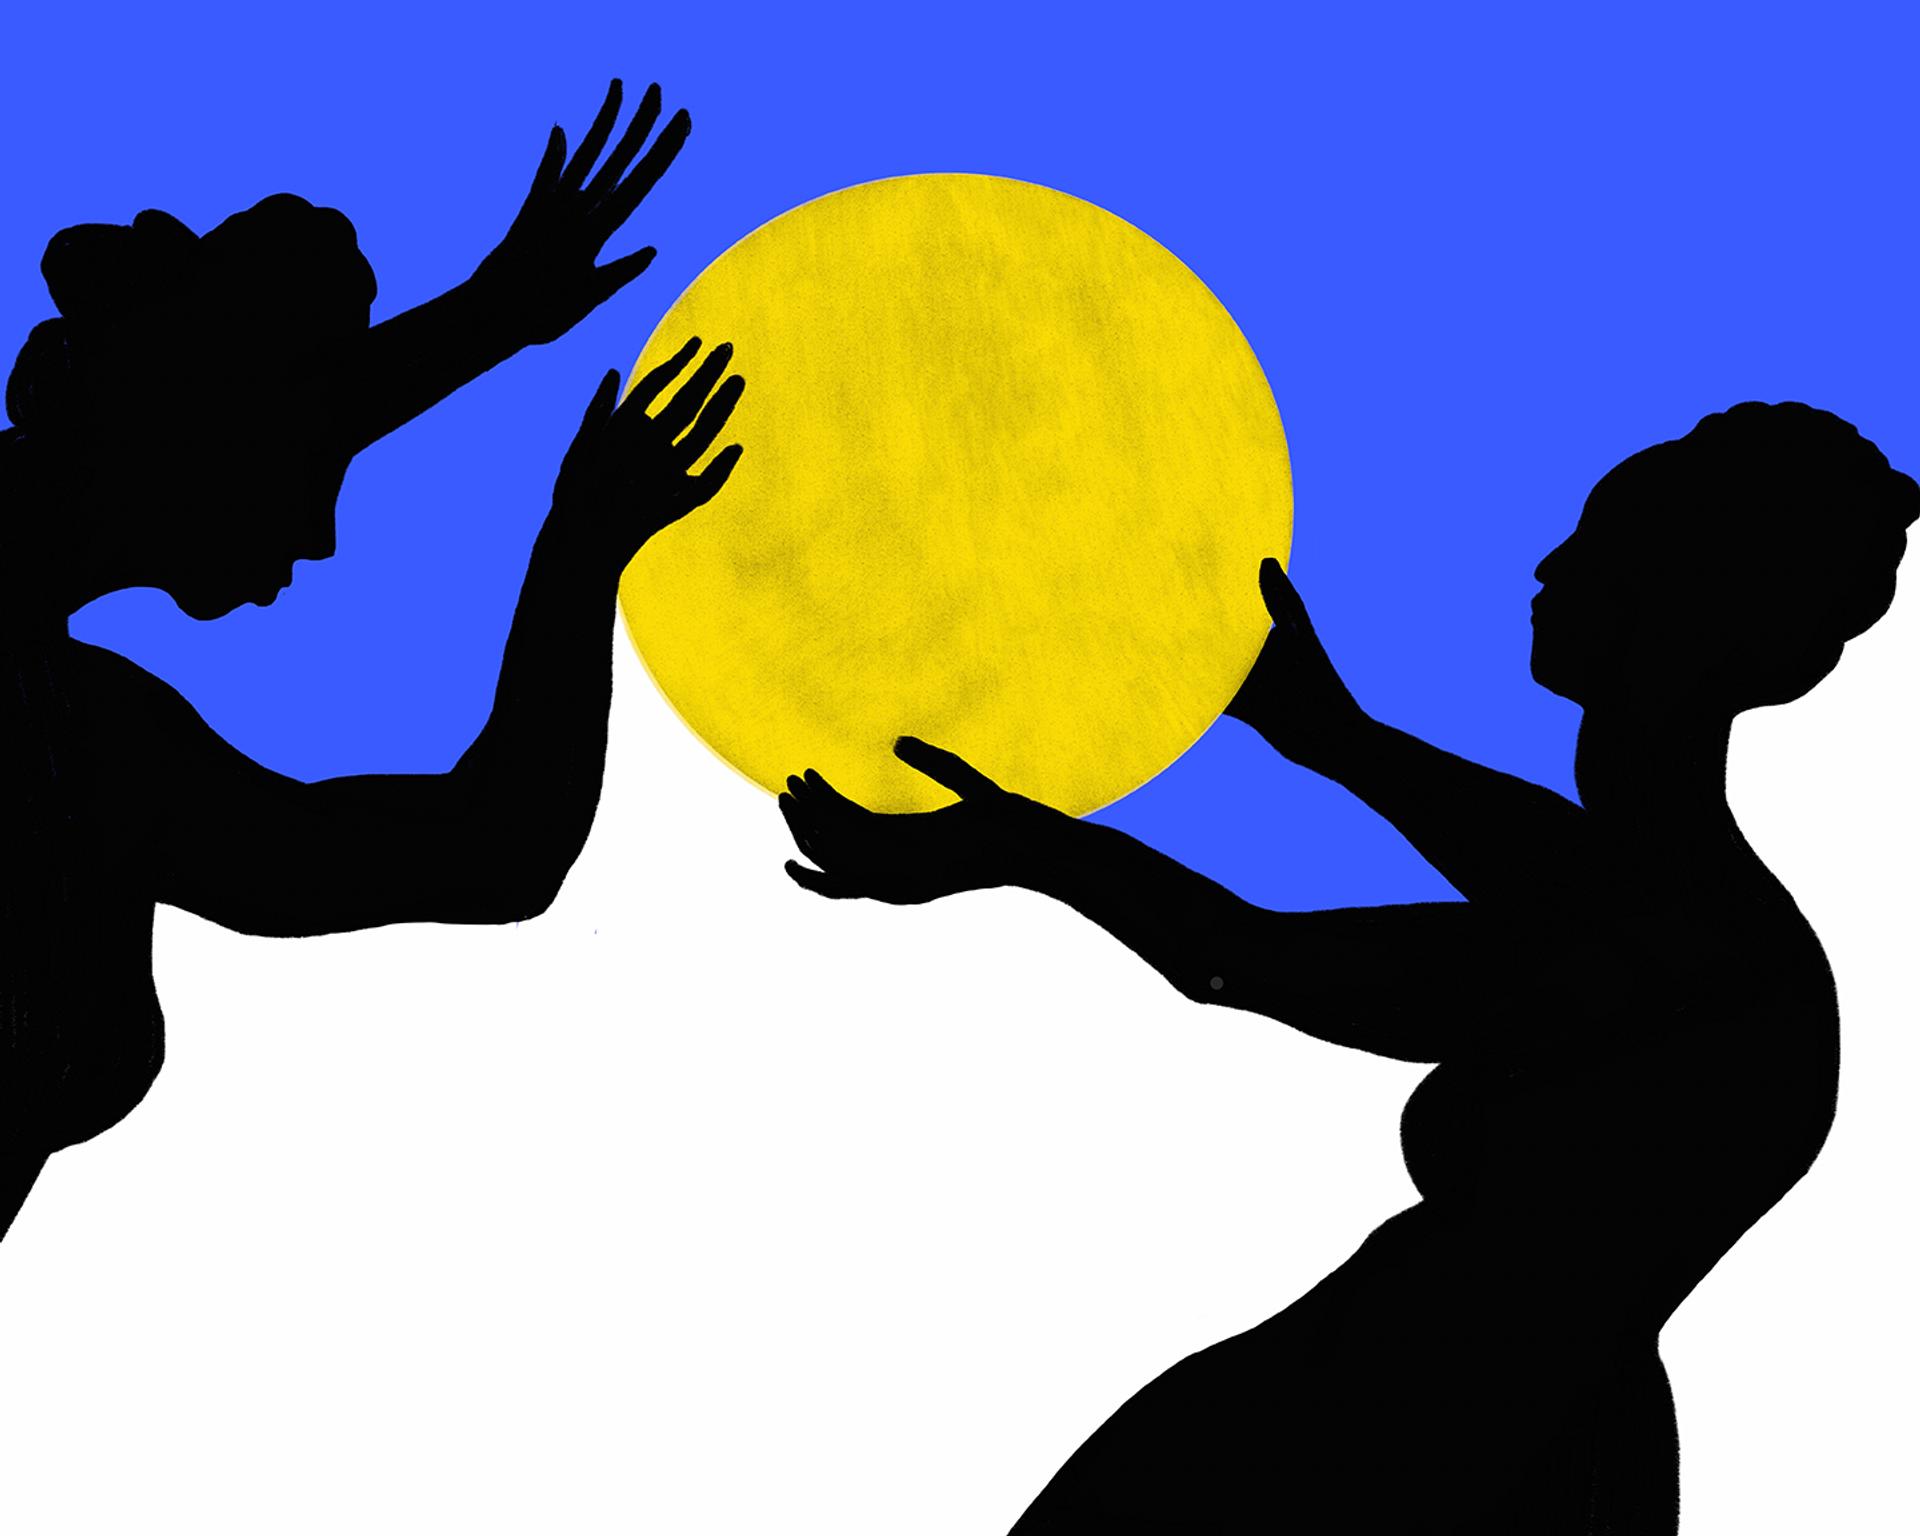 Diana Ejaita, Reach for the Sun (2021) Little Sun